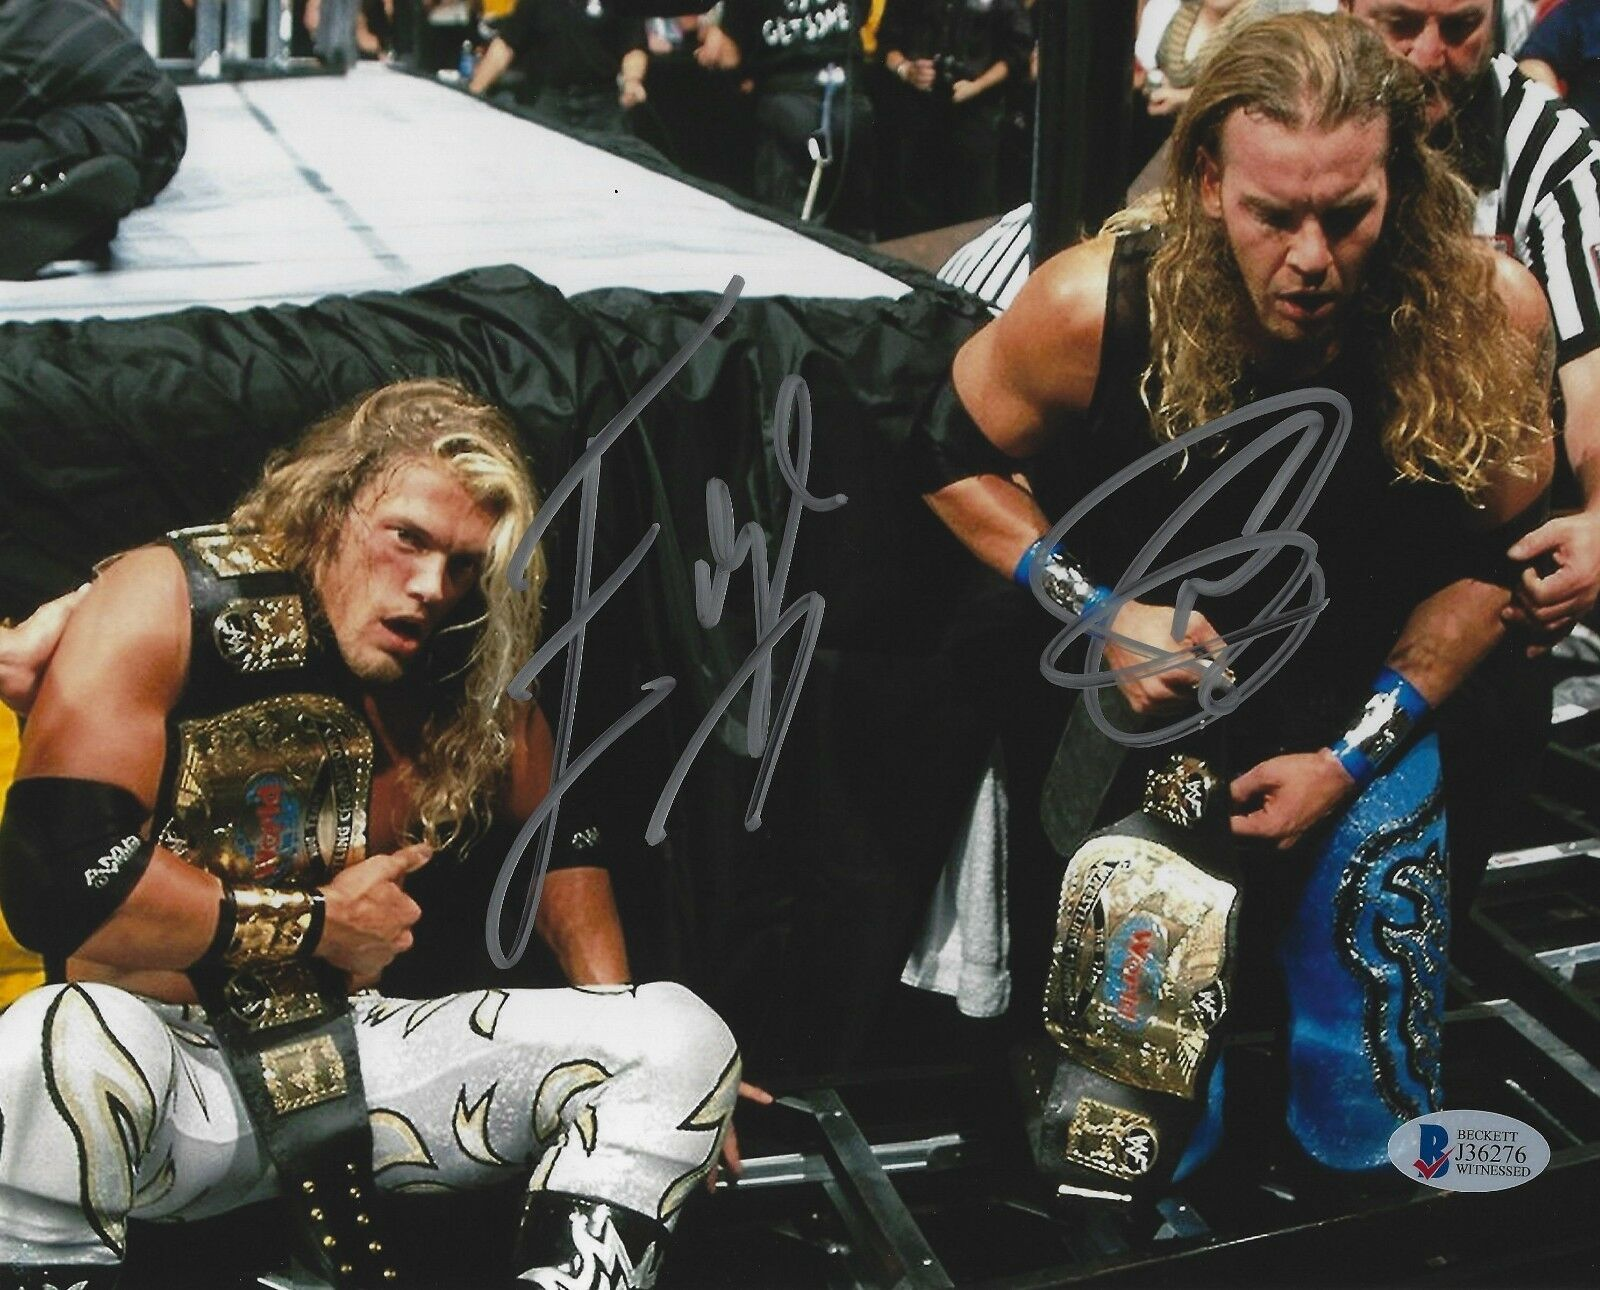 Edge & Christian Wwe Bas 8x10 foto firmada cert. de autenticidad Pro Wrestling Foto Autógrafo 3